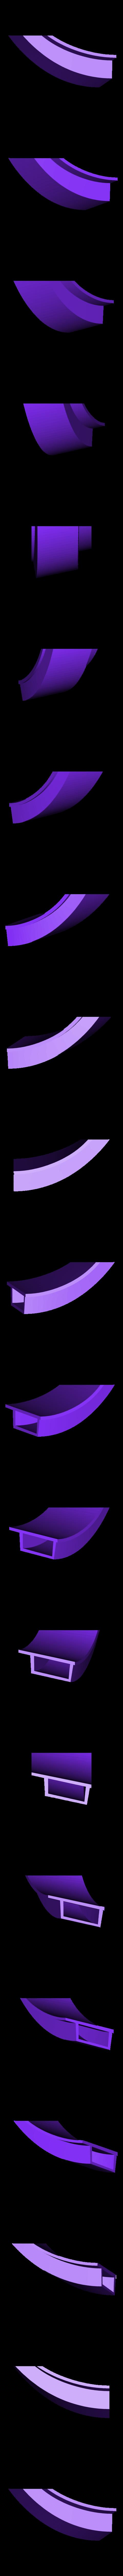 Part 7 v1.stl Download STL file ARF Trooper Helmet • 3D print object, VillainousPropShop